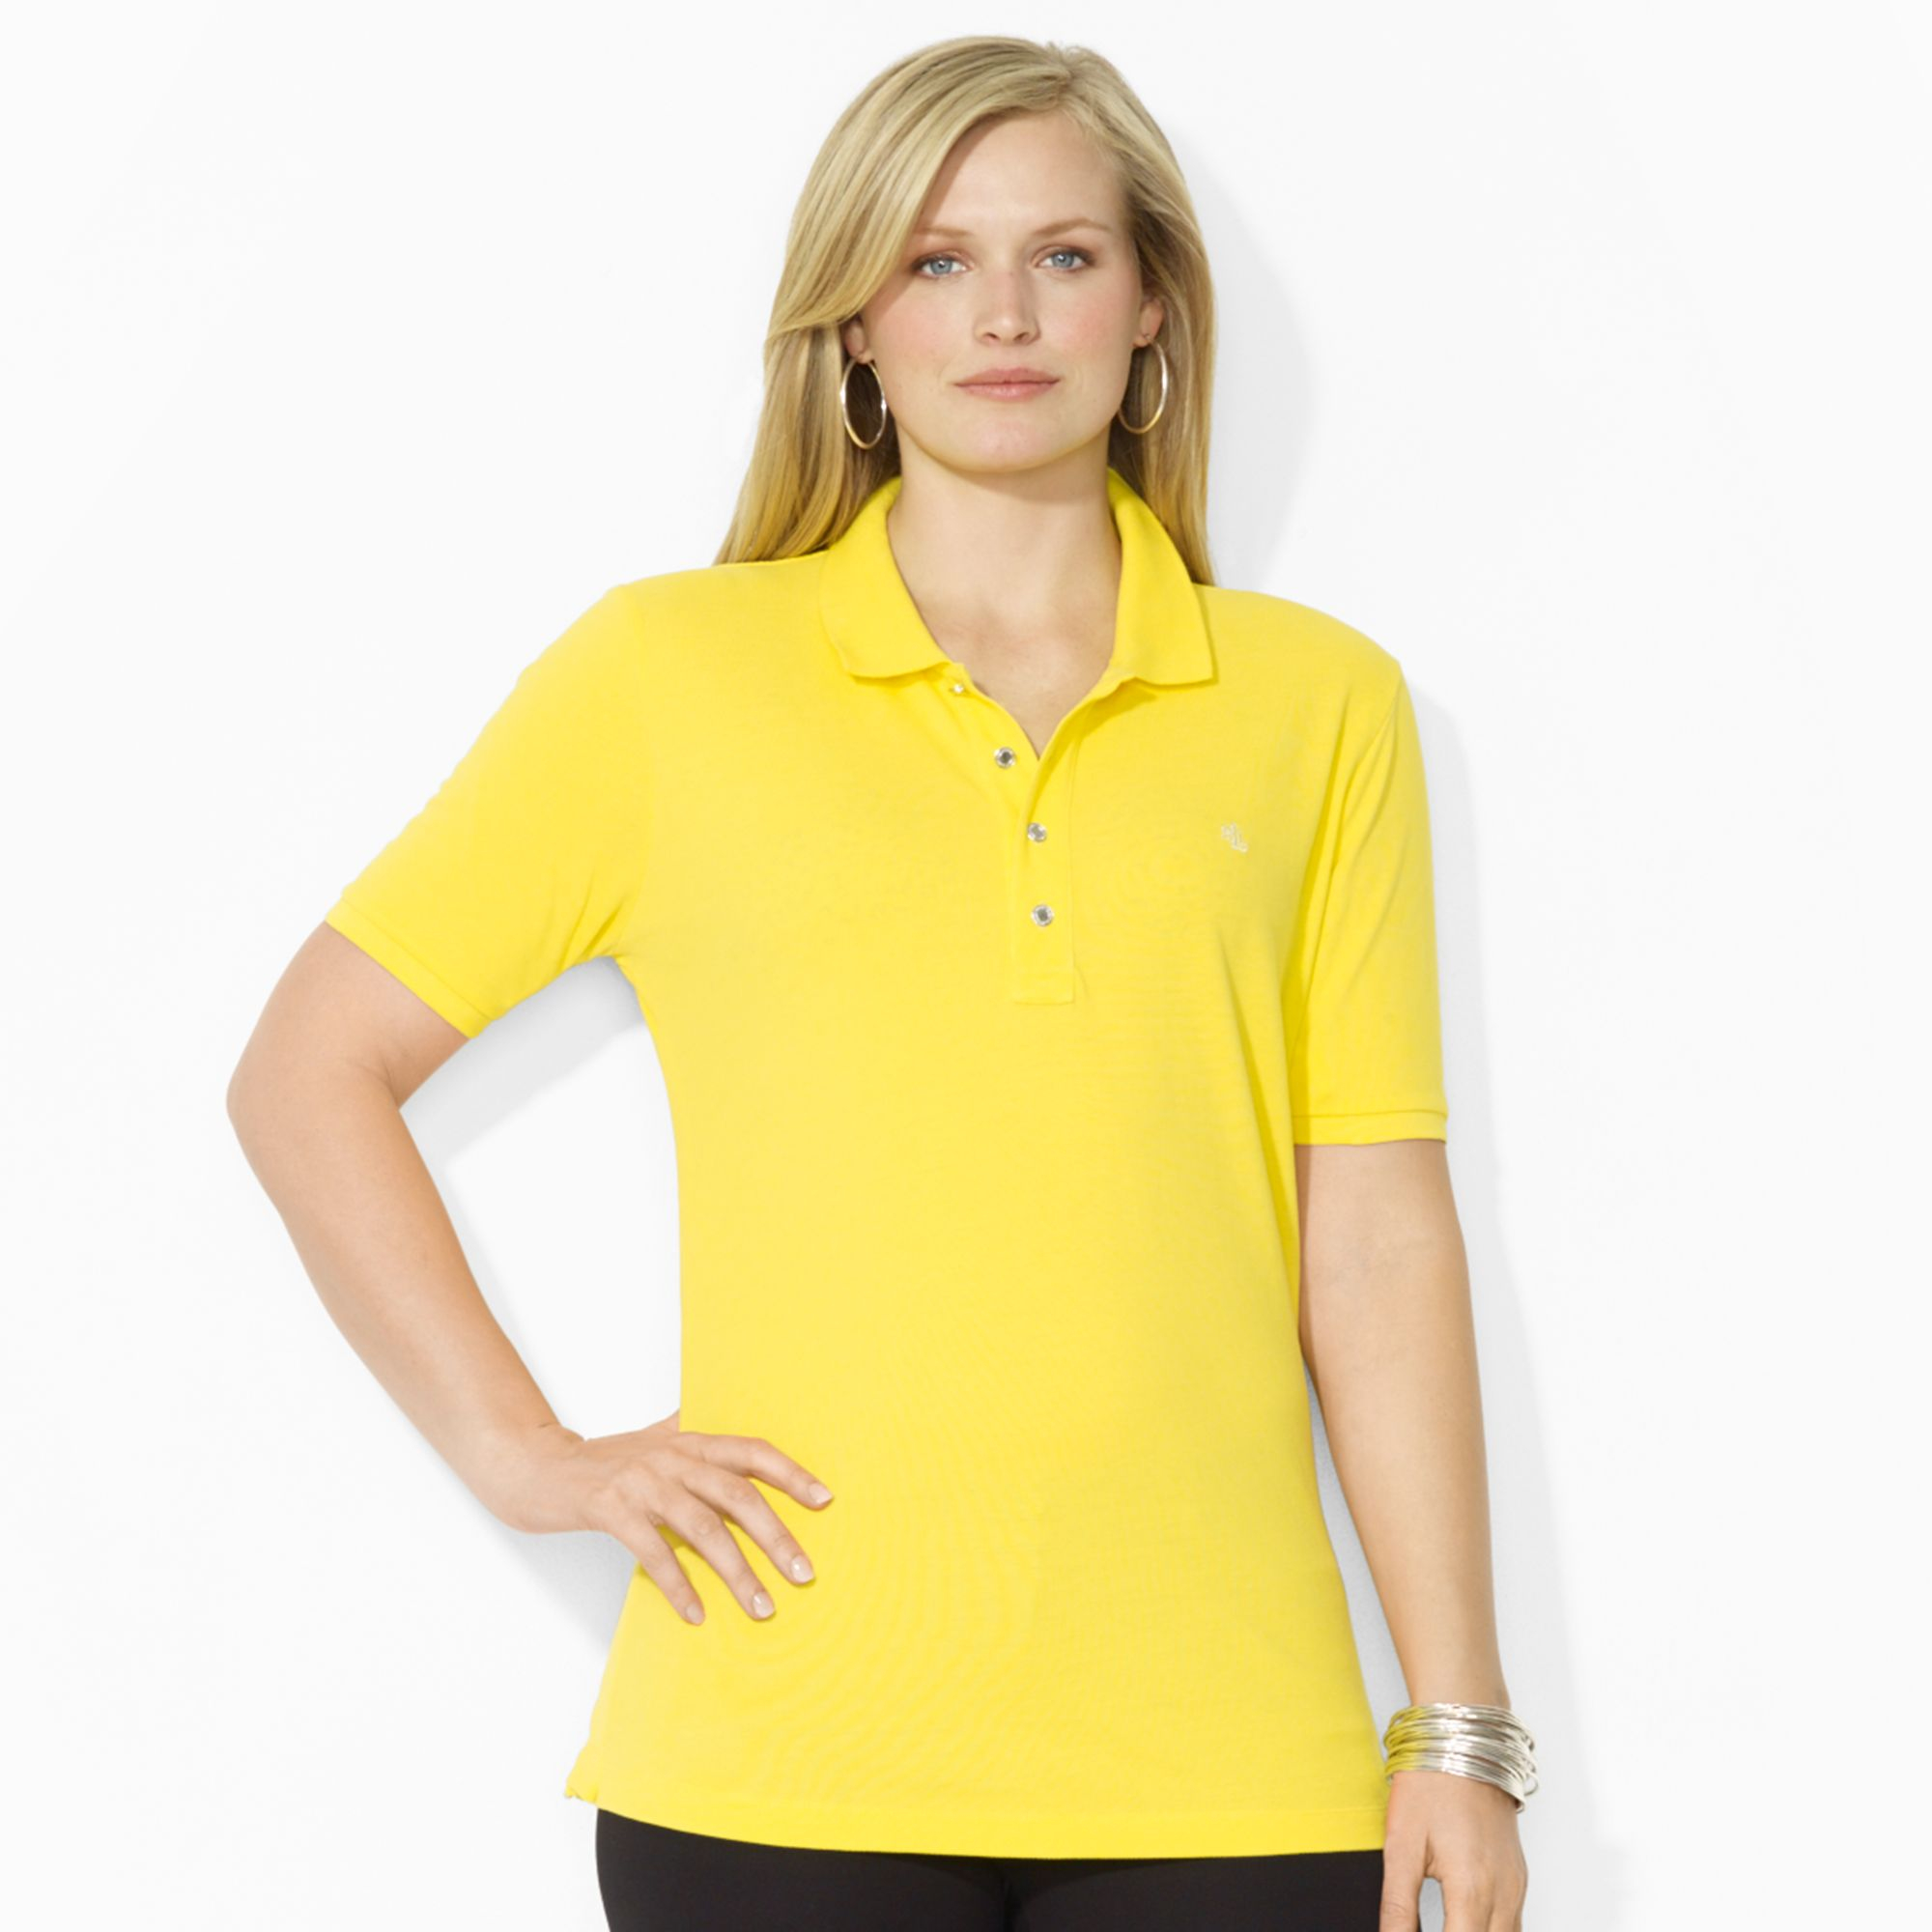 3531c884 ... where to buy ralph lauren polo t shirt sizes 42e86 c02a8